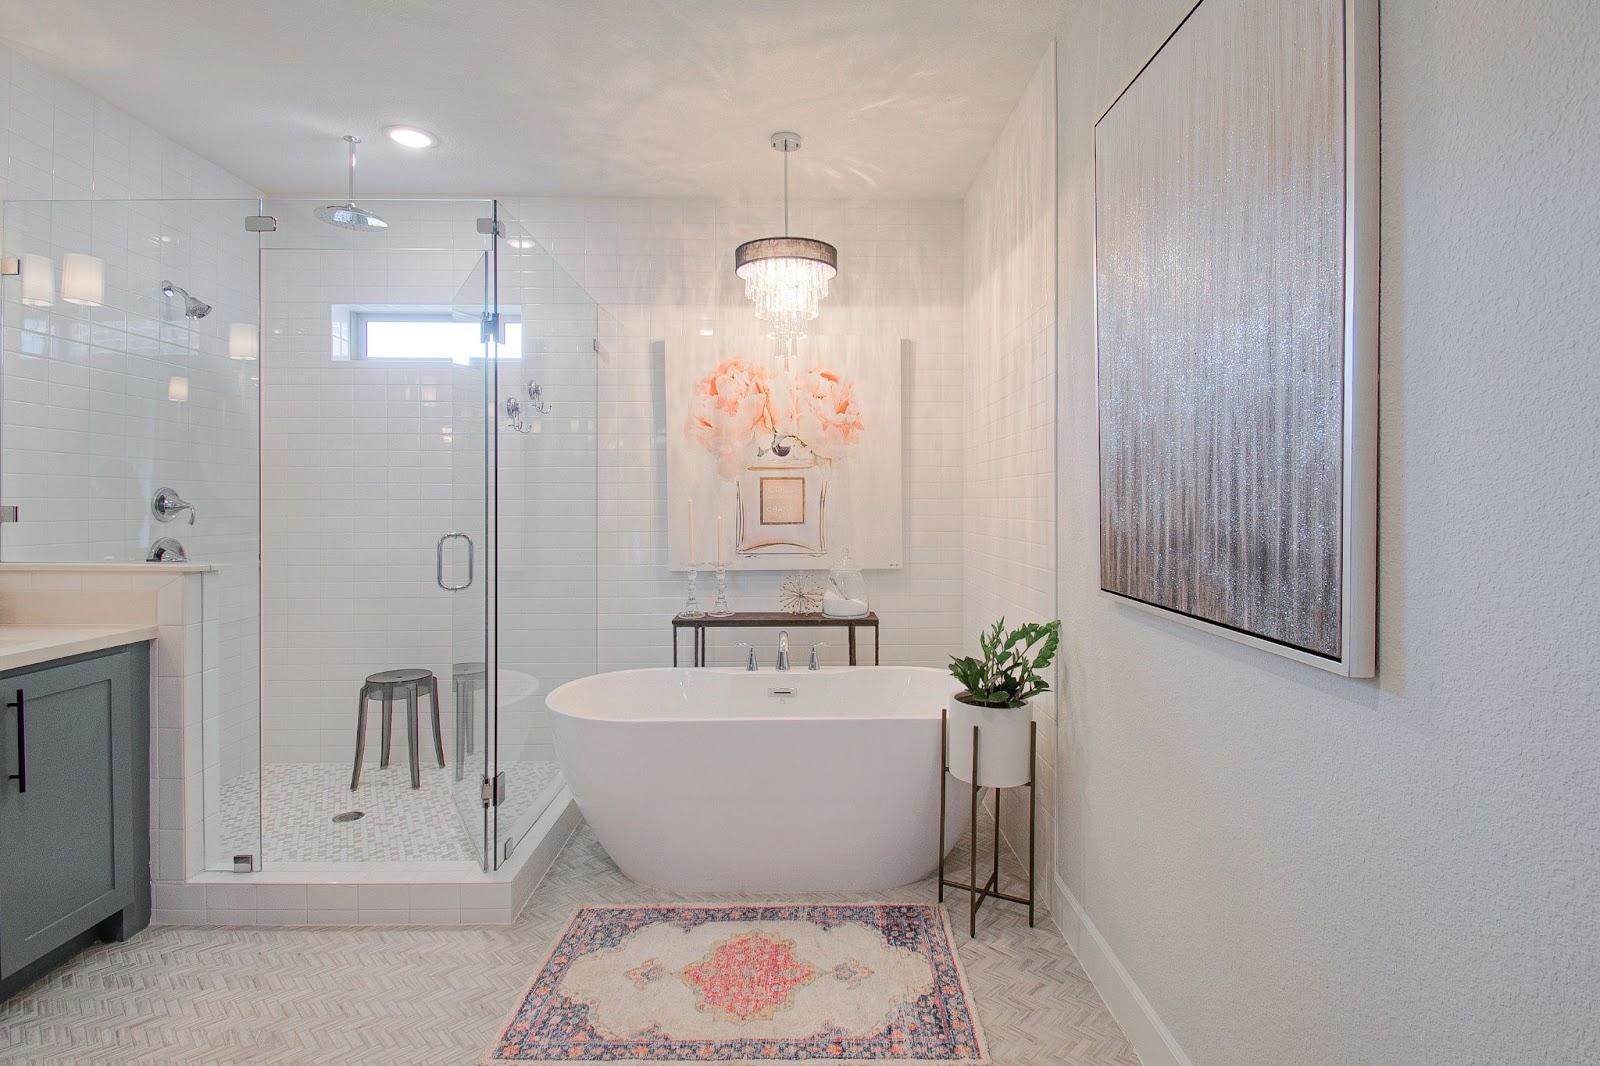 builder-grade home after custom interior design chandelier free standing tub glass shower herringbone tile